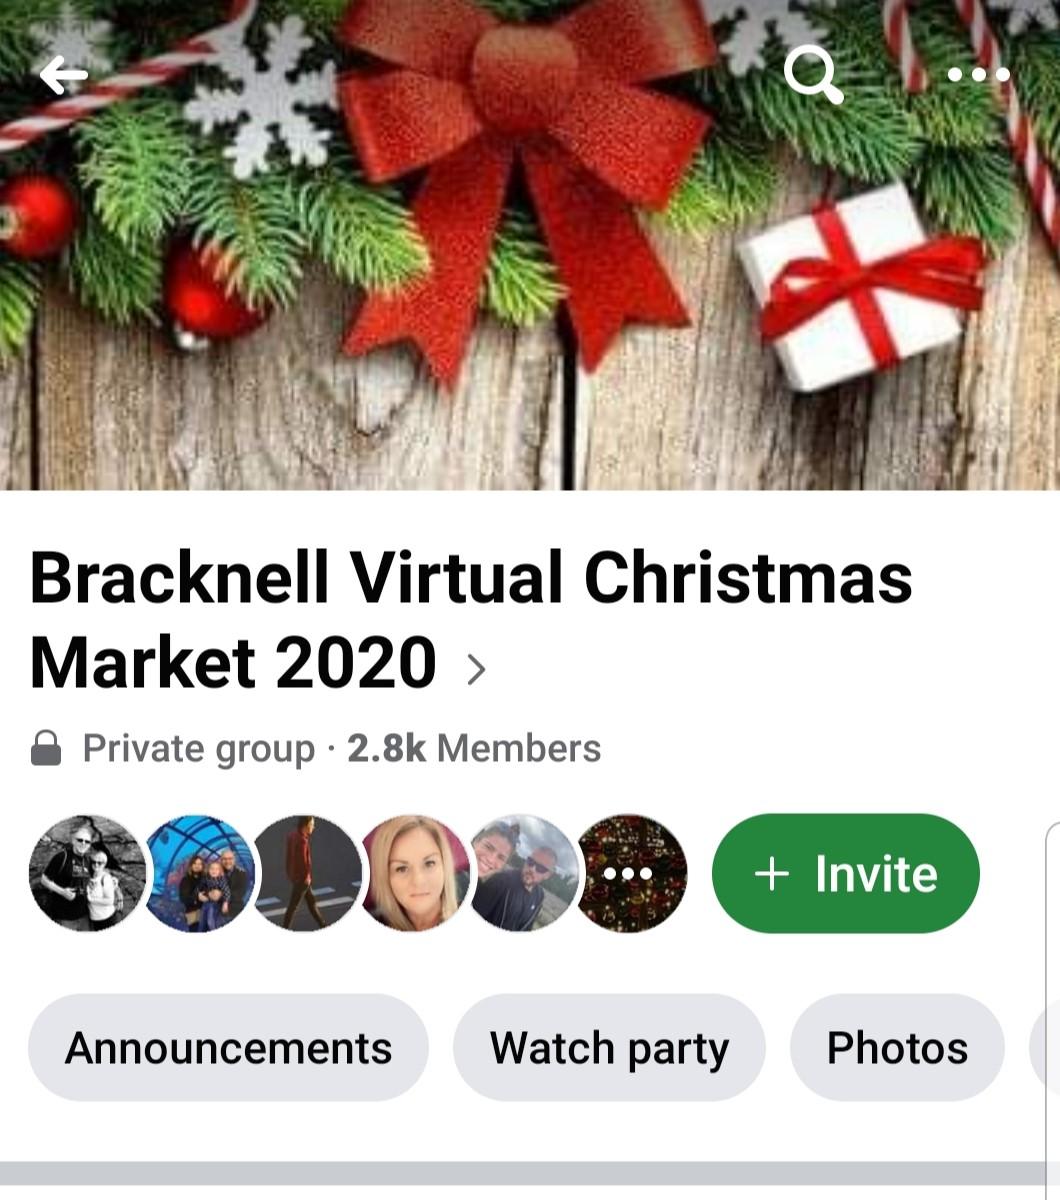 Virtual Christmas Bracknell